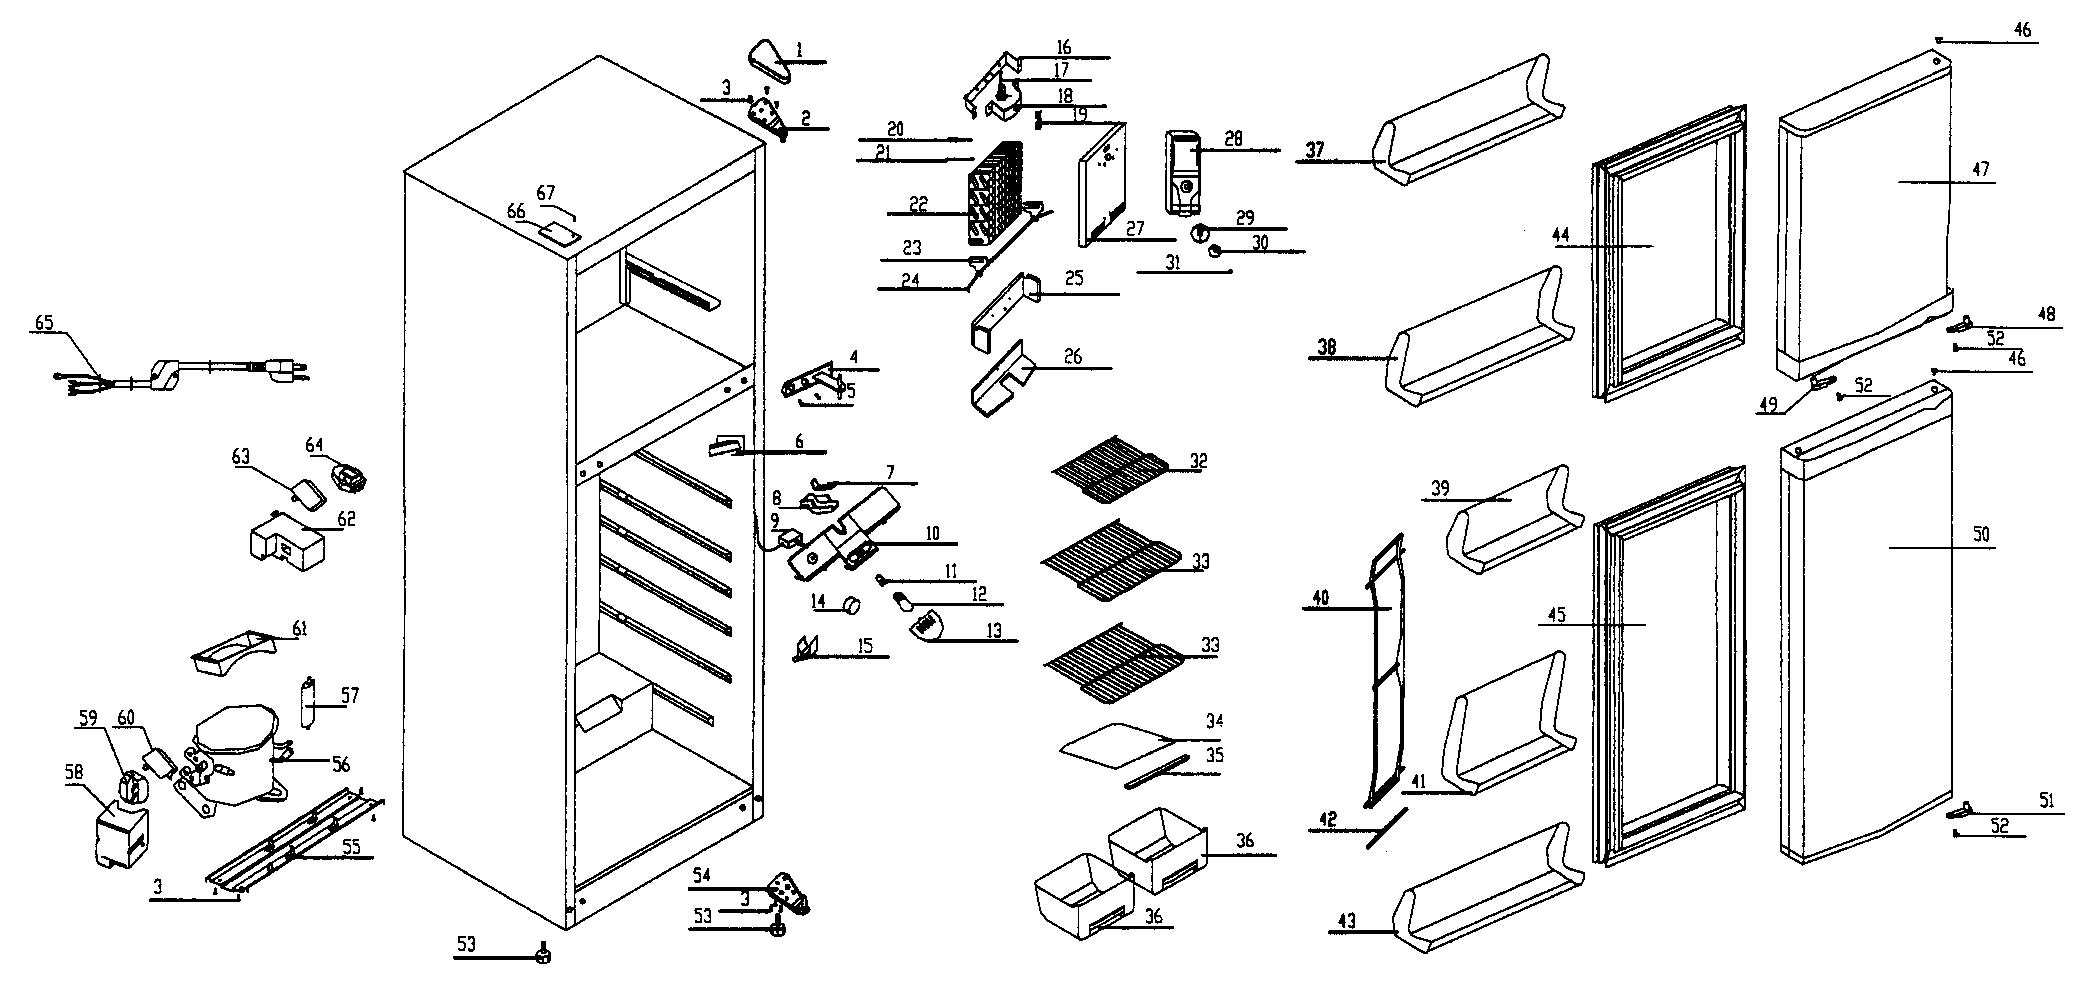 haier fridge diagram